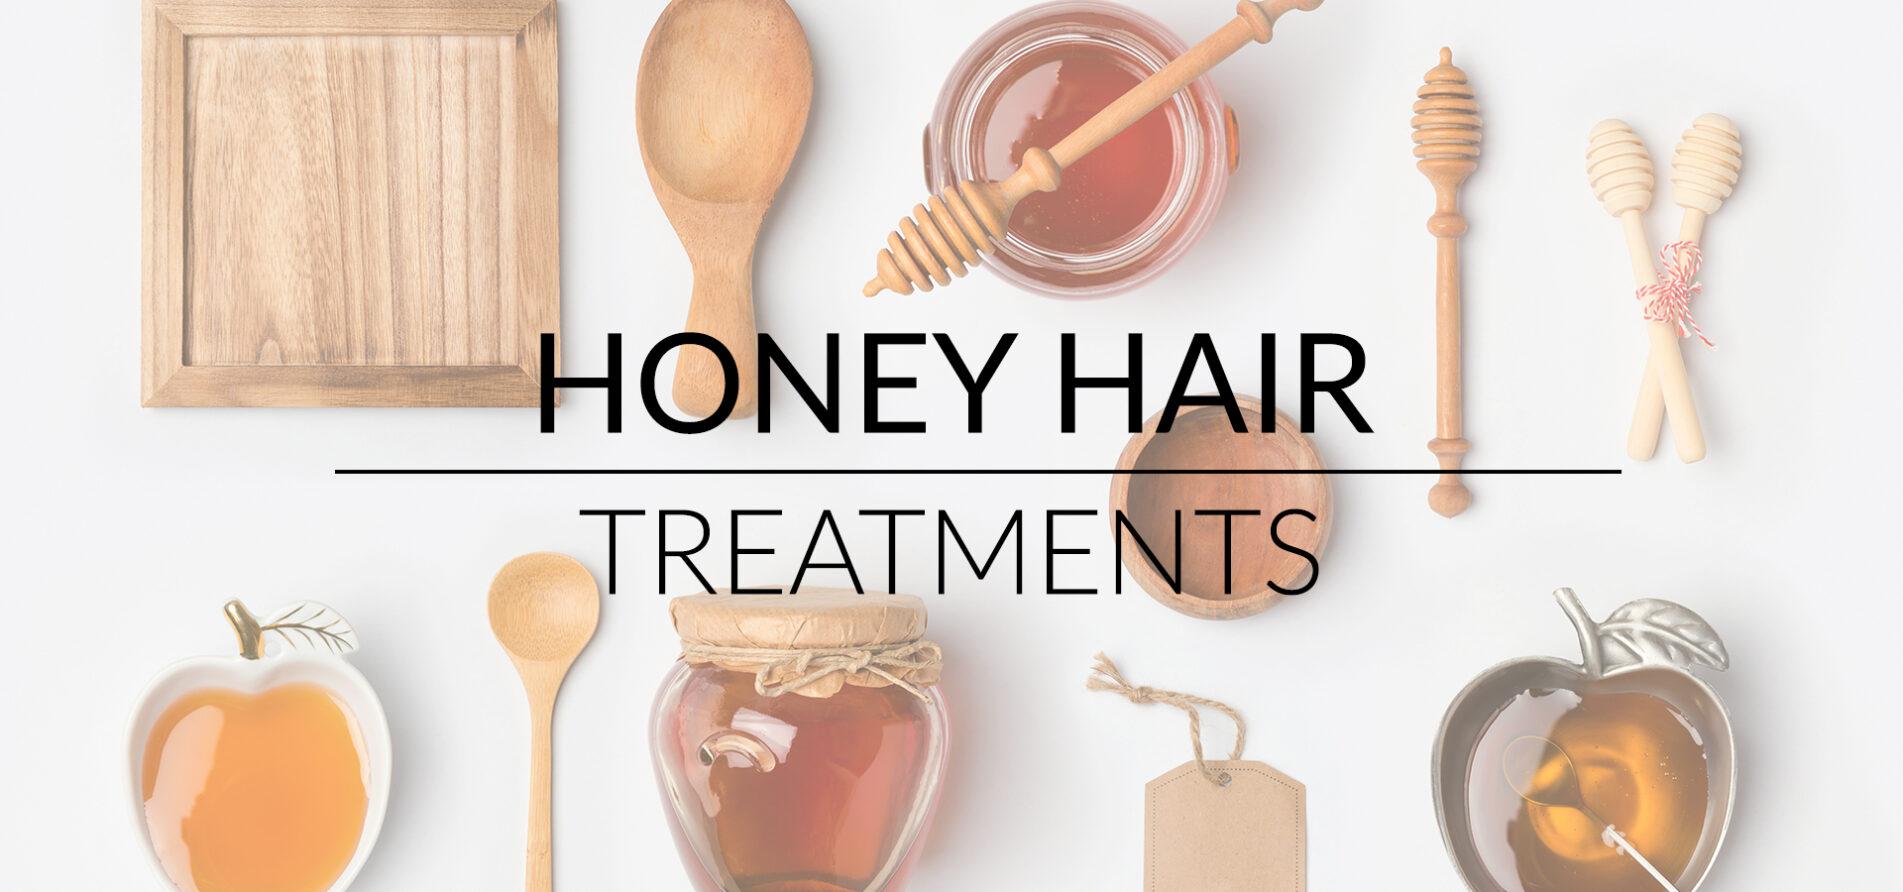 Honey Hair Treatments